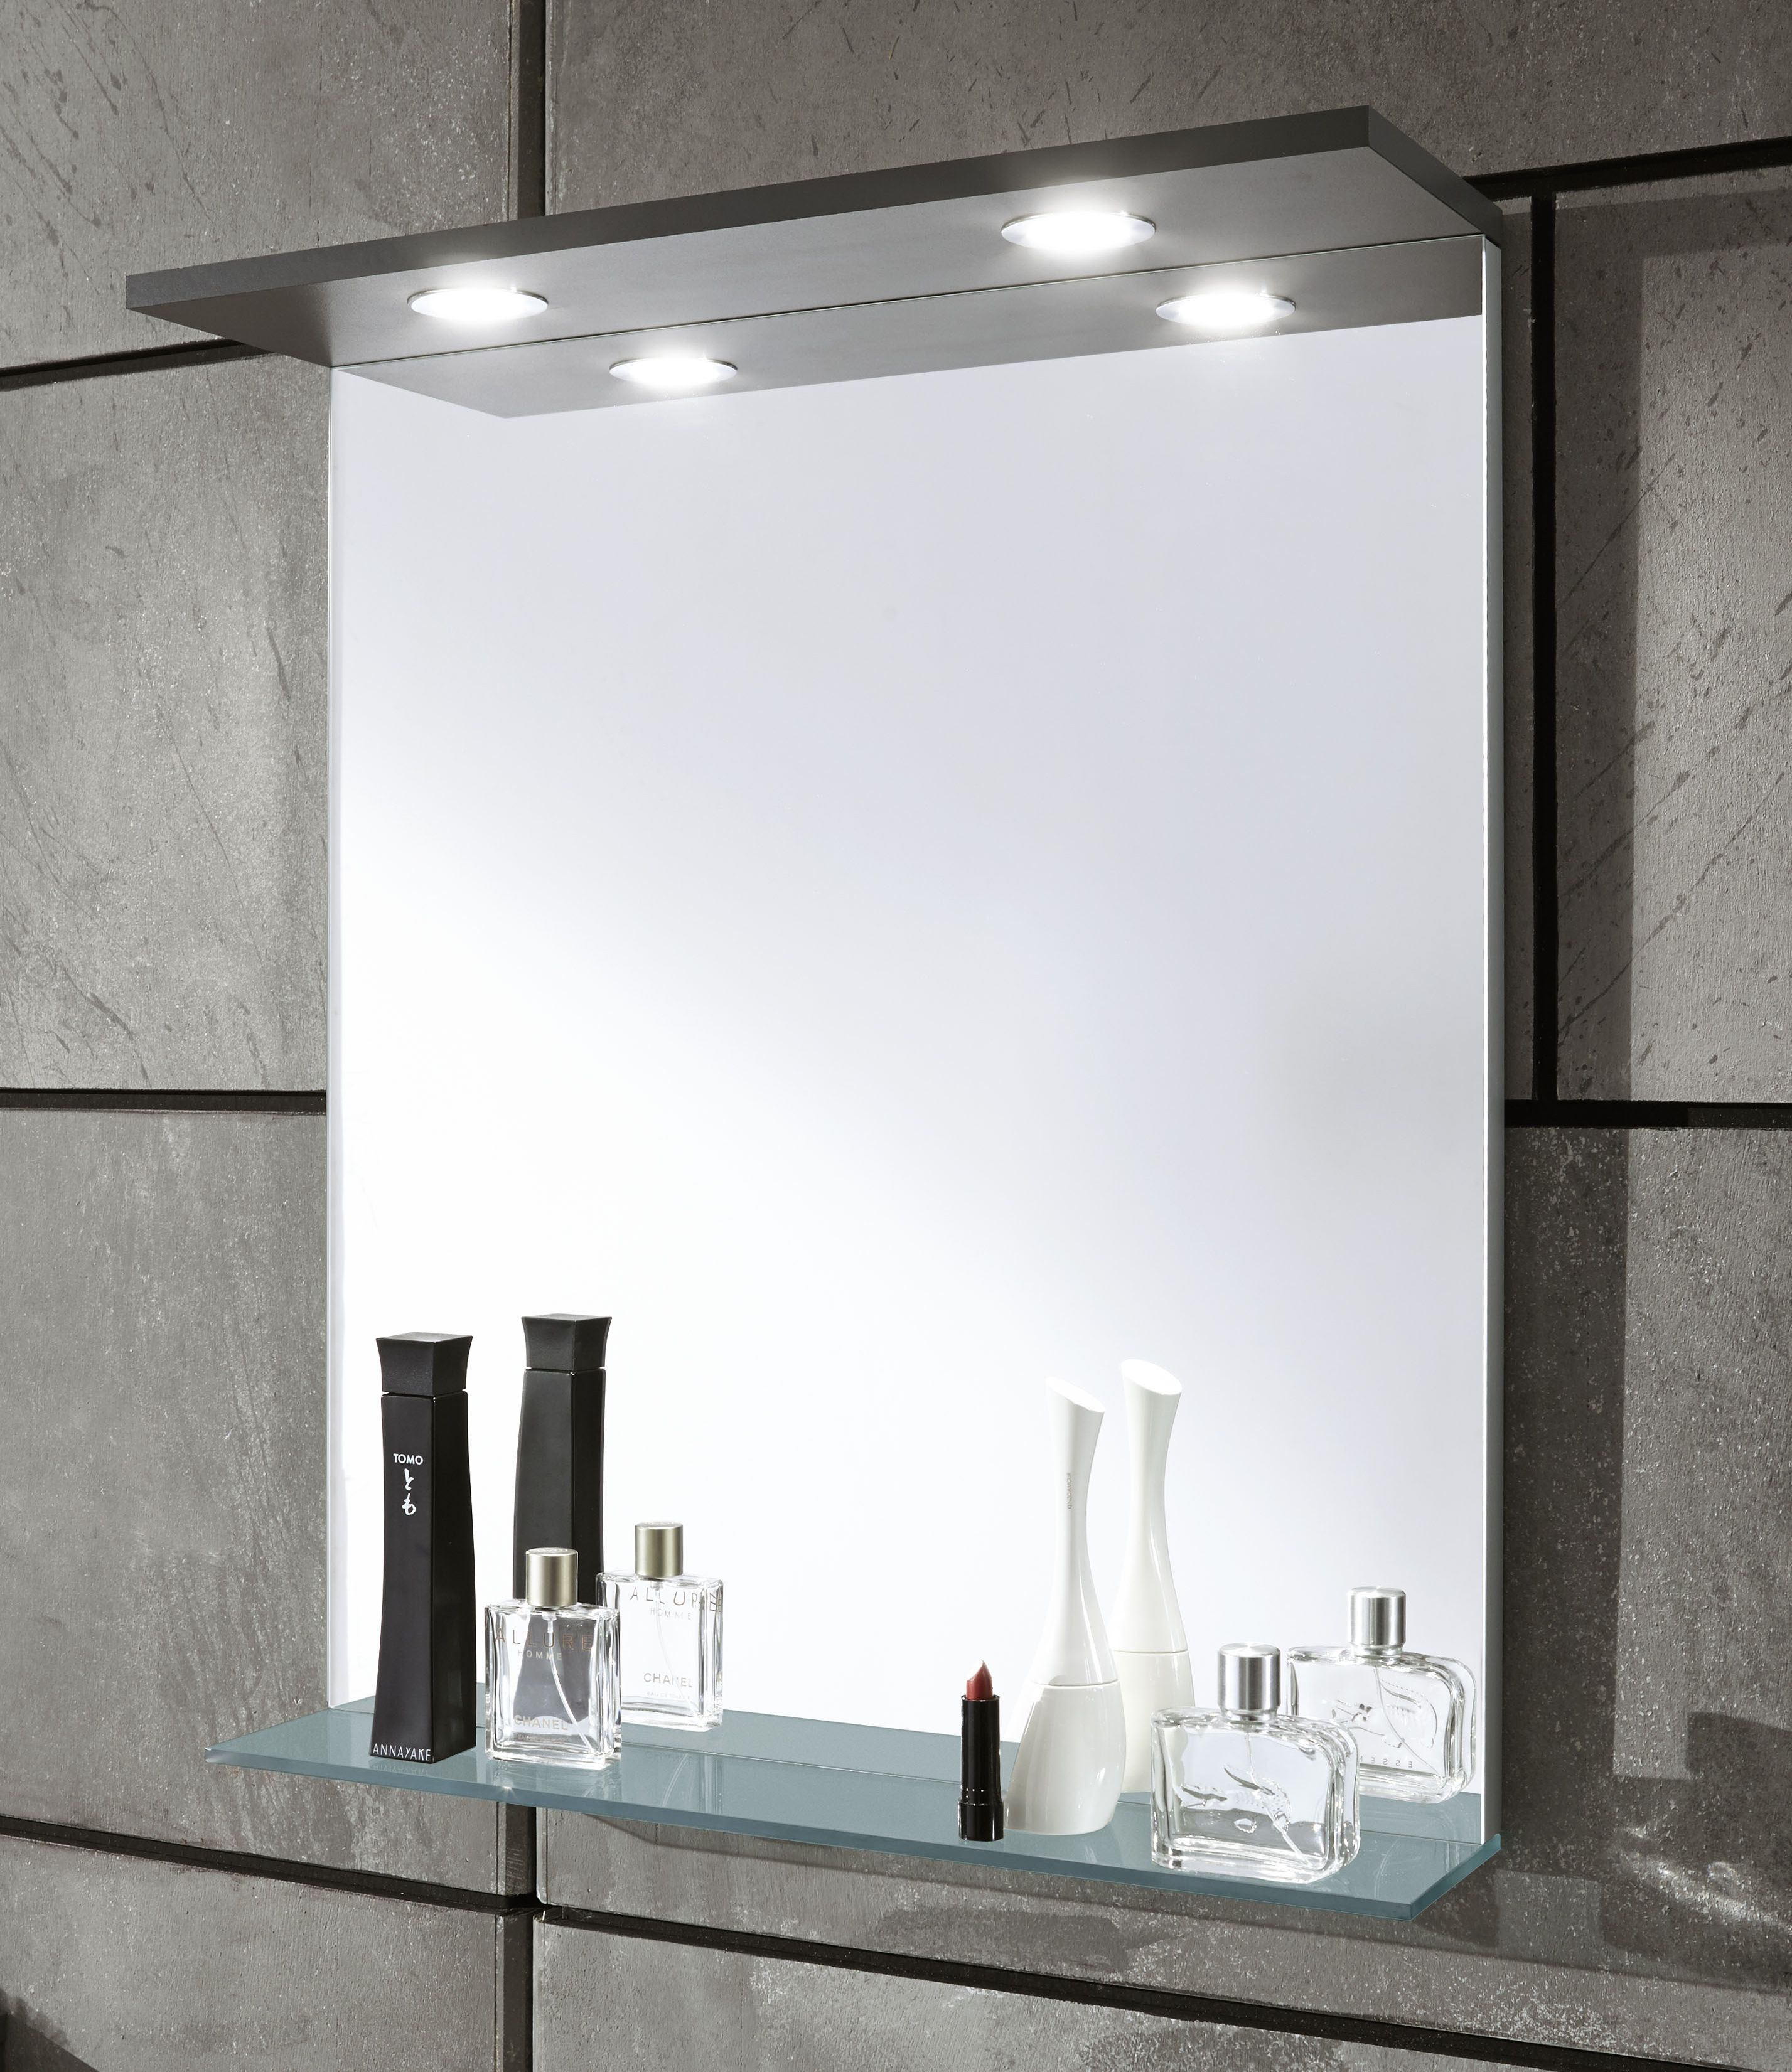 marlin programme marlin bad 3060 spiegelschr nke spiegel g nstig kaufen m bel universum. Black Bedroom Furniture Sets. Home Design Ideas